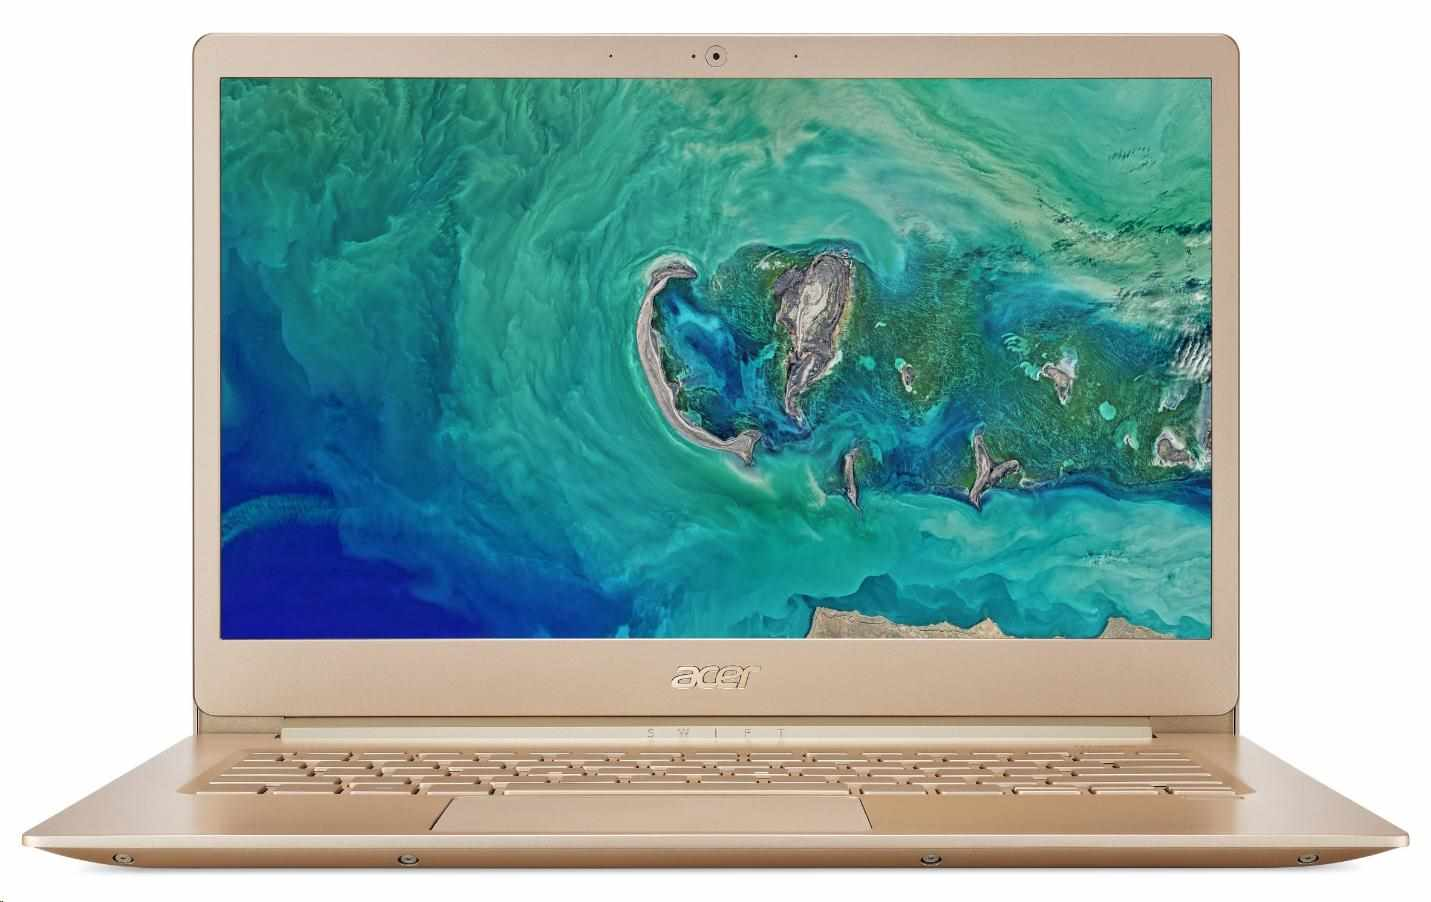 "ACER NTB Swift 5 SF514-52T-556K - i5-8250U@1.6GHz,14""FHD IPS mat,8GB,256SSD,HD graphics,cam,HDMI,usb-c,W10H,gold"